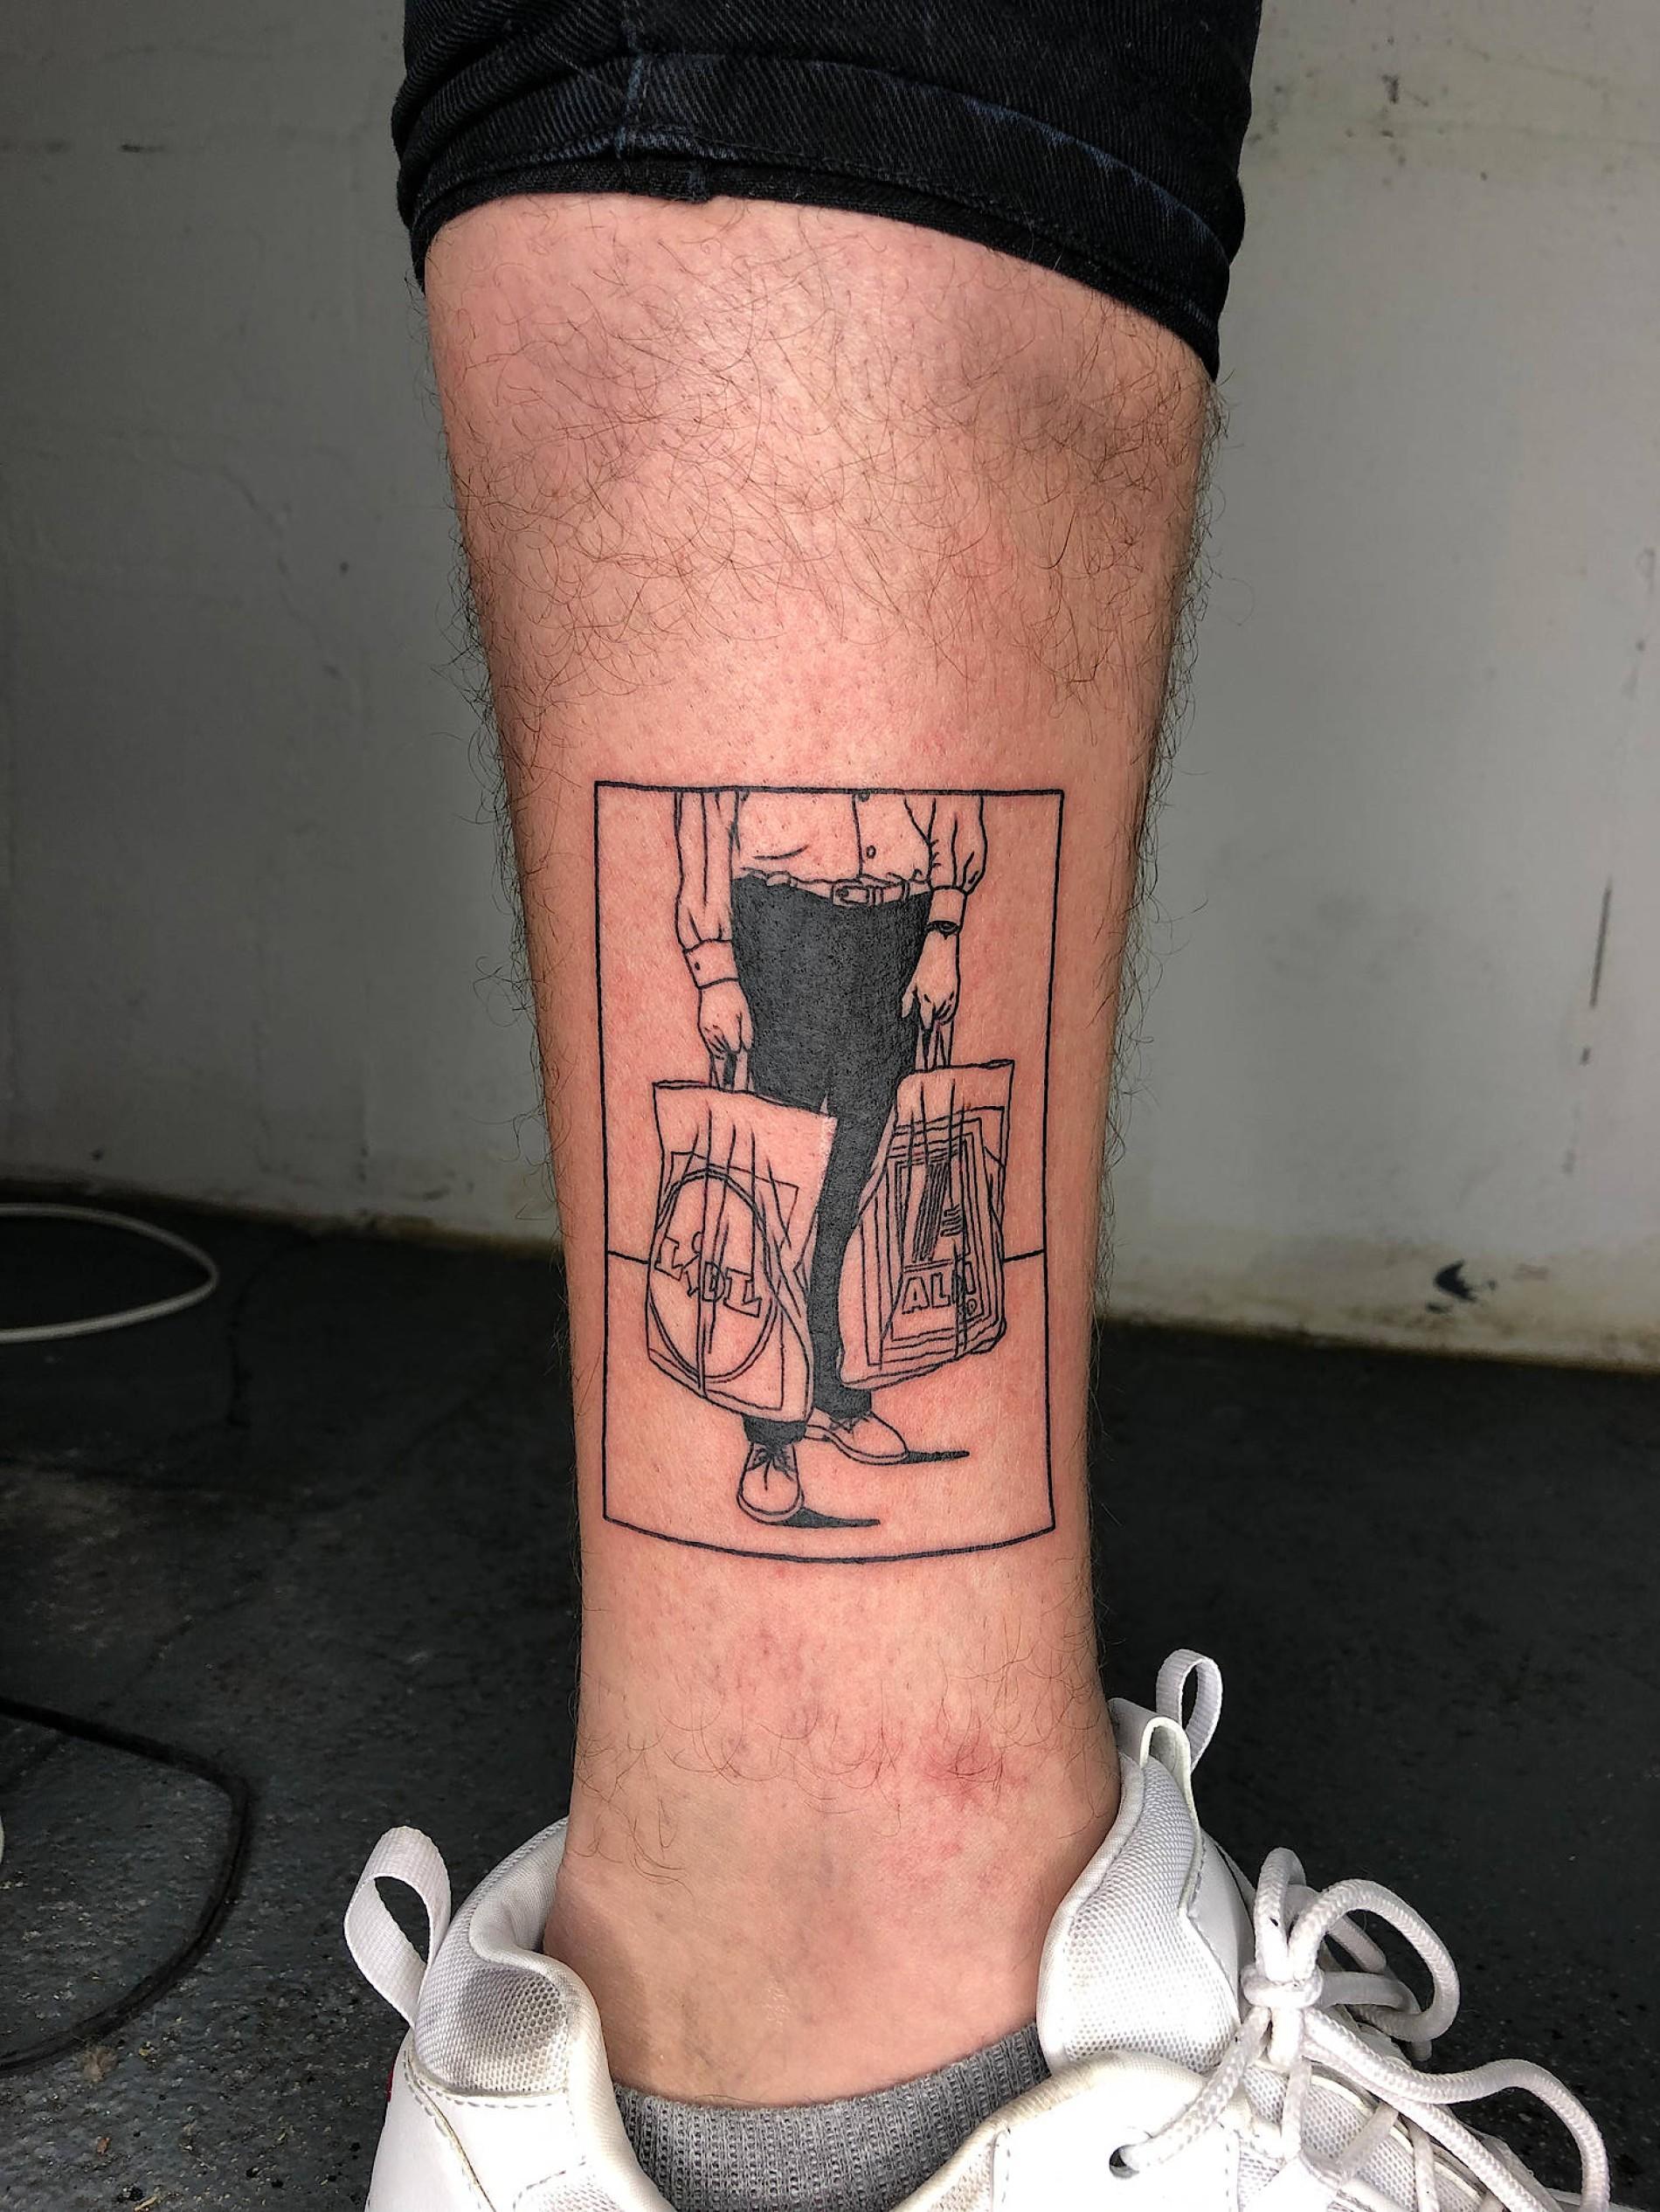 Tattoo ss blutgruppe Gullible TikTok